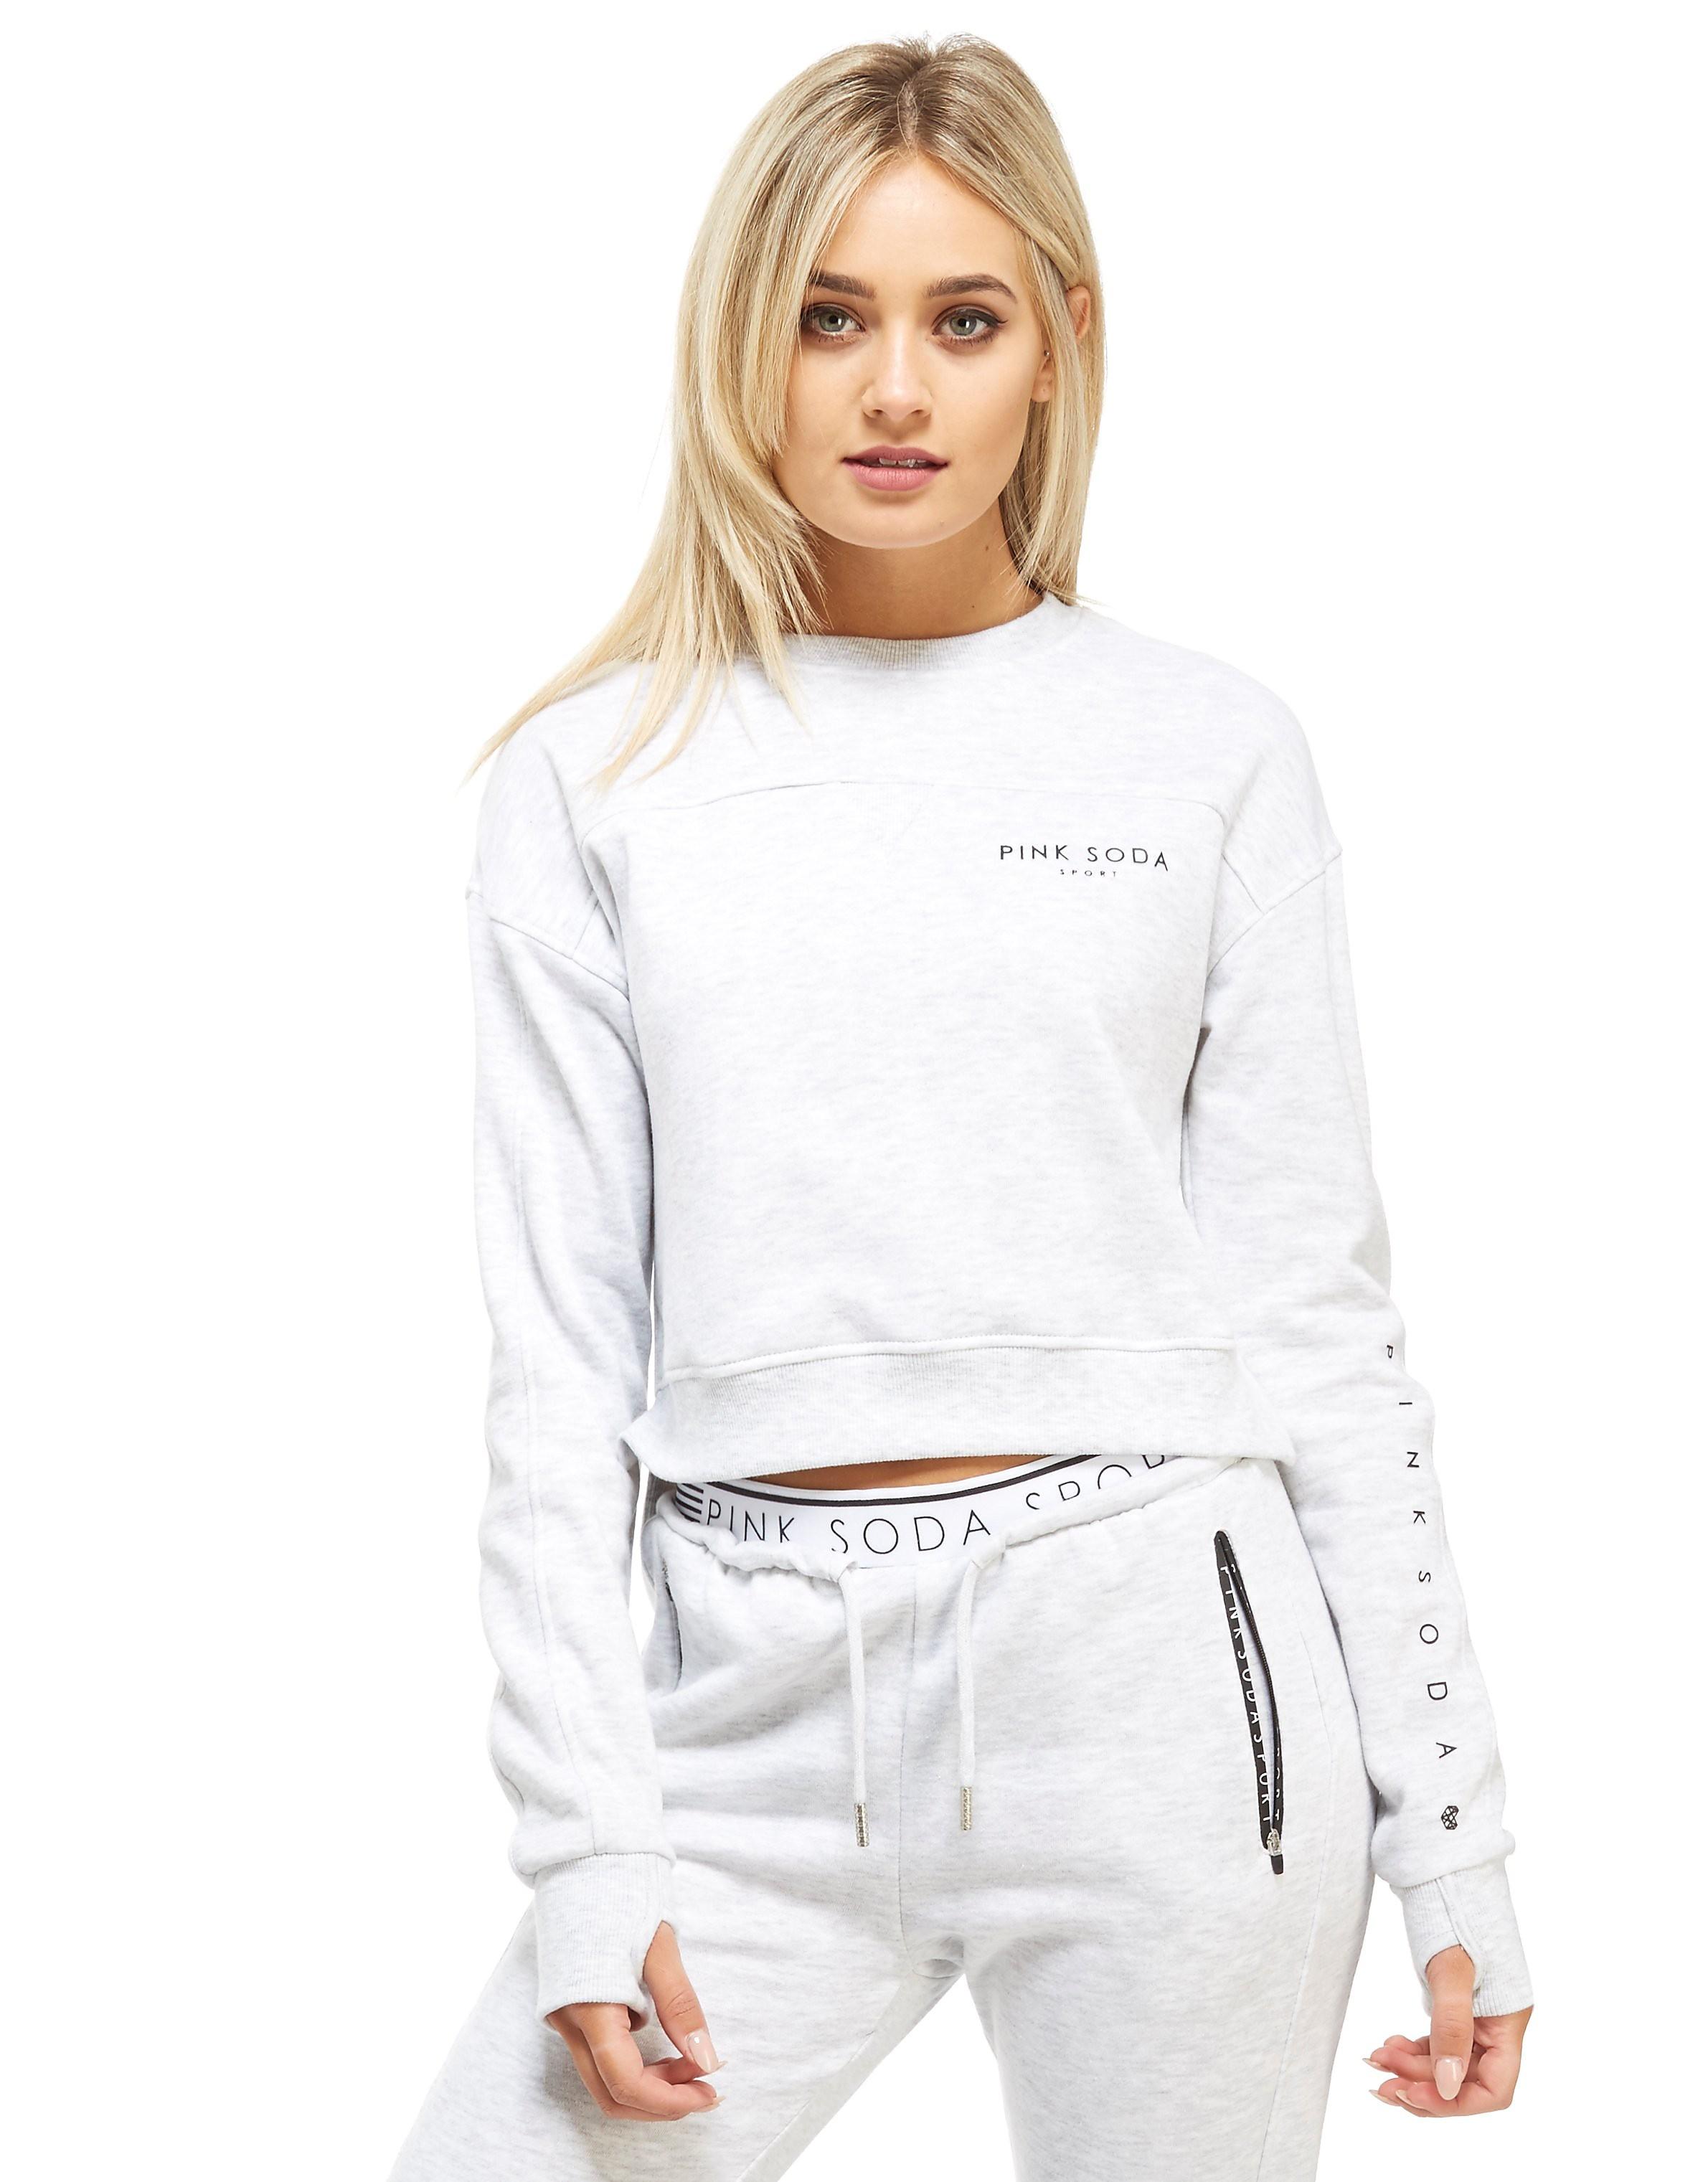 Pink Soda Sport Drop Hem Crew Sweatshirt